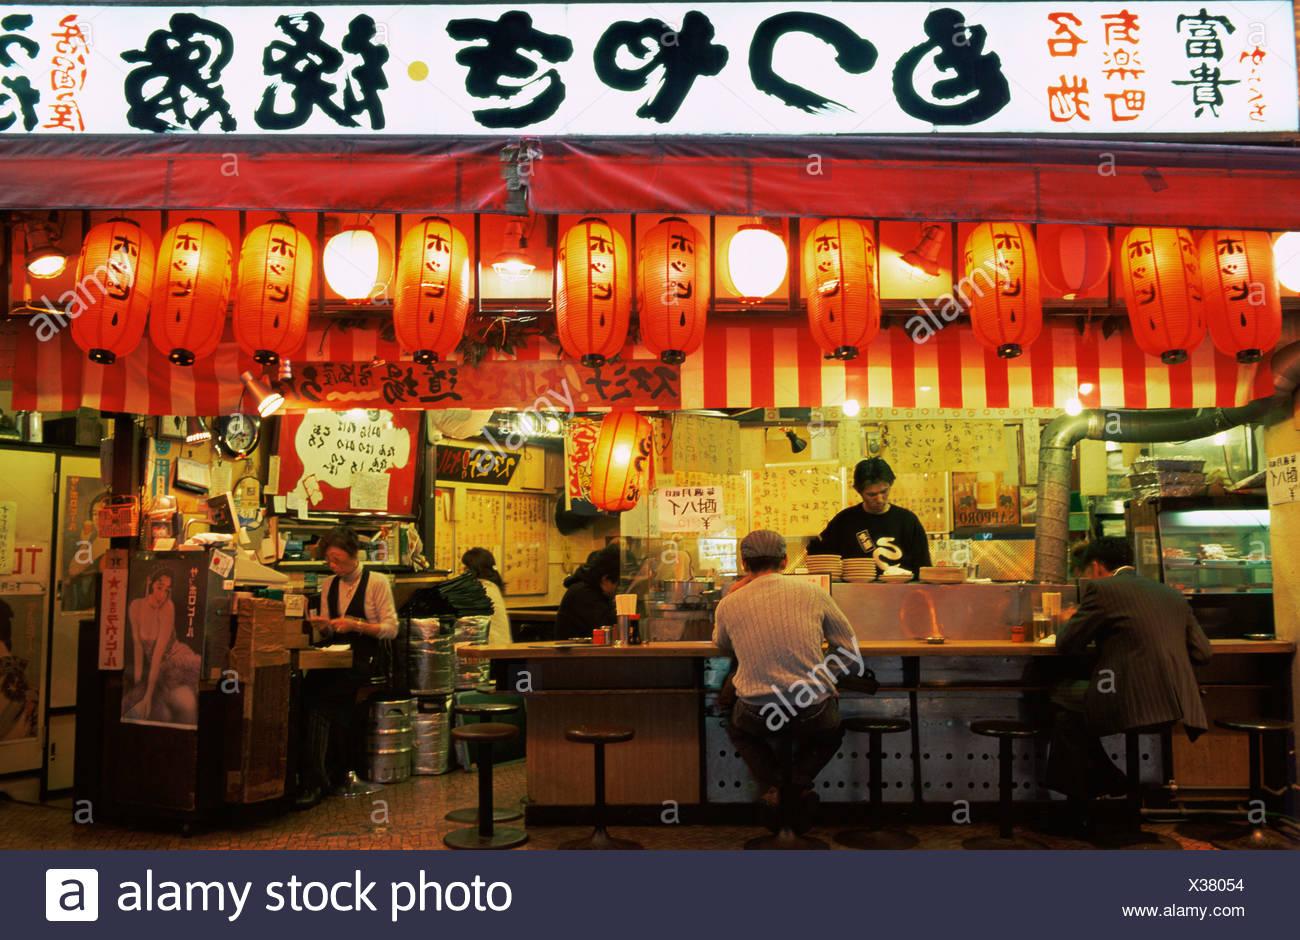 Japan Asia Honshu Tokyo Ginza Japanese Food Japanese Fast Food Restaurant Restaurants Outdoor Restaurant Din Stock Photo Alamy